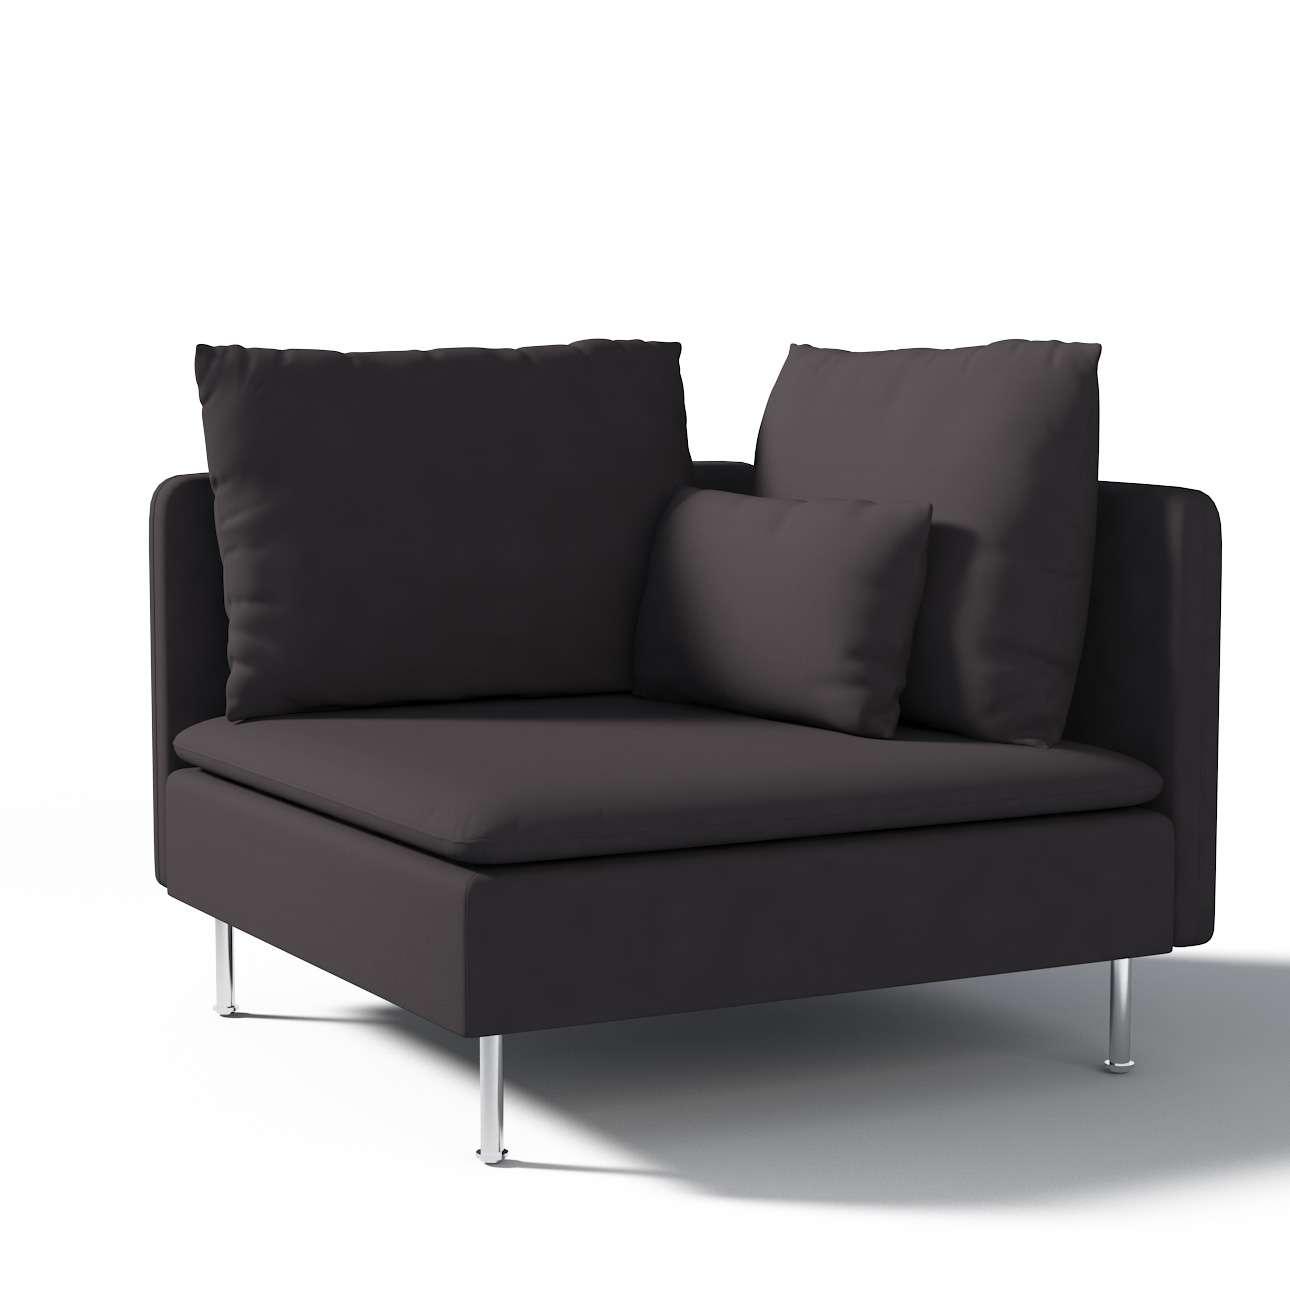 s derhamn bezug f r eckelement schwarz dekoria. Black Bedroom Furniture Sets. Home Design Ideas